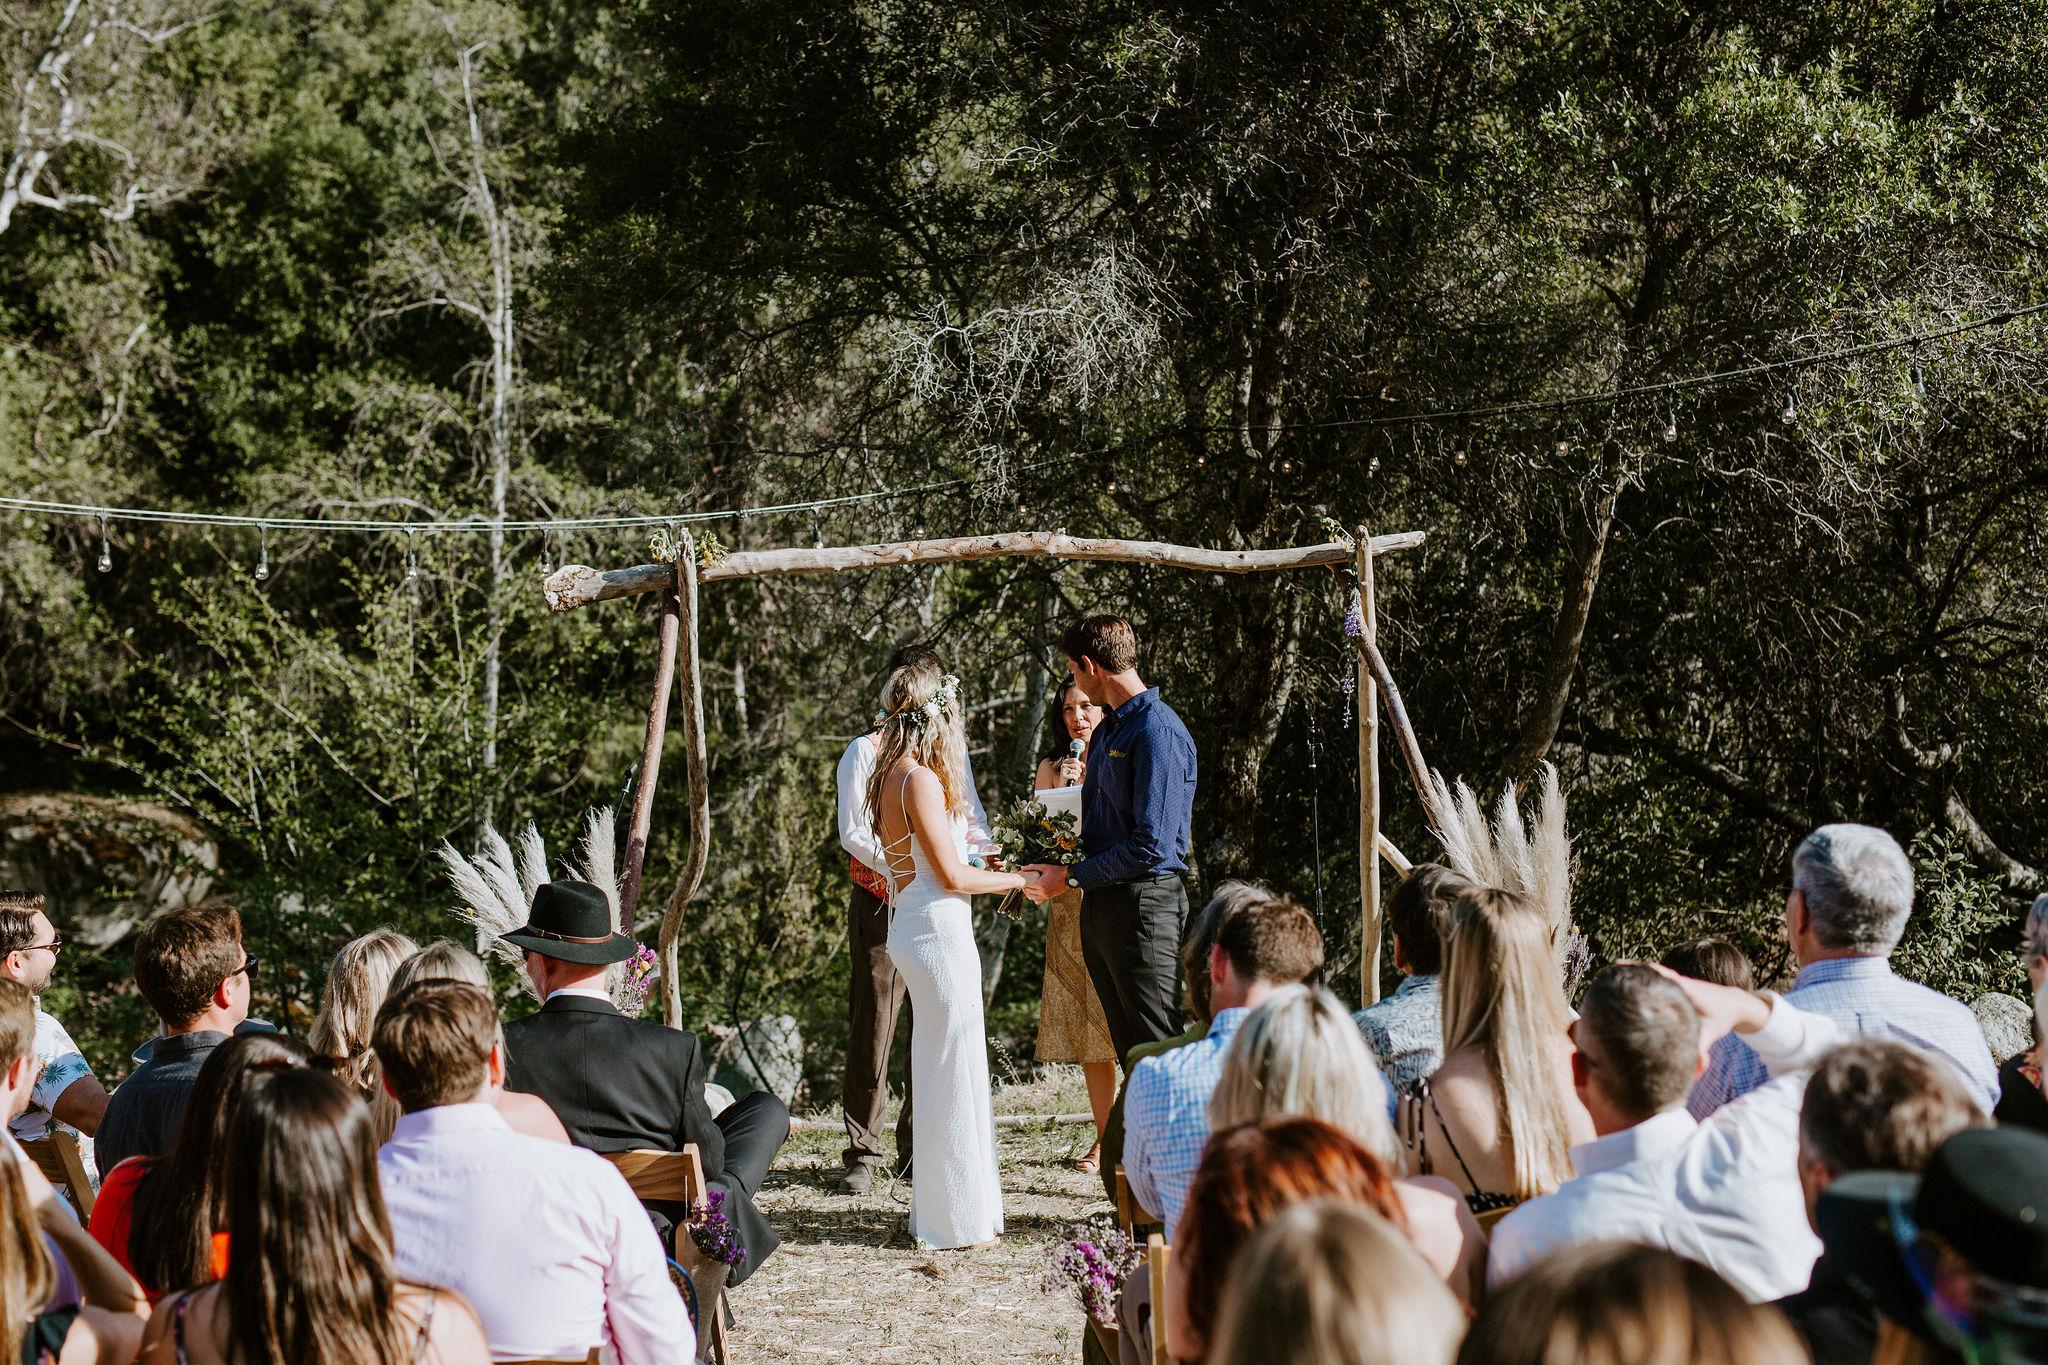 RedwoodRanch_Geoff&LyndsiPhotography_Mike&Amanda_Ceremony68.jpg